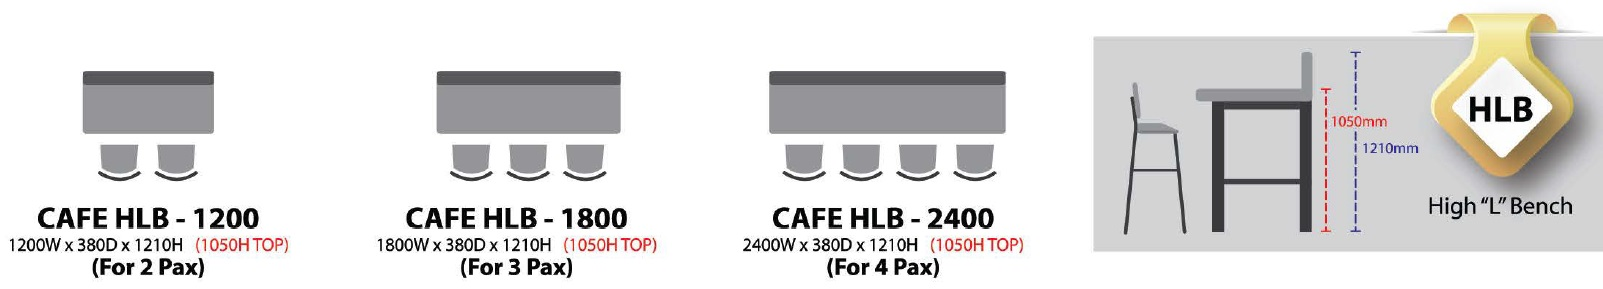 CAFE HIGH L BENCH MALAYSIA KUALA LUMPUR SHAH ALAM KLANG VALLEY